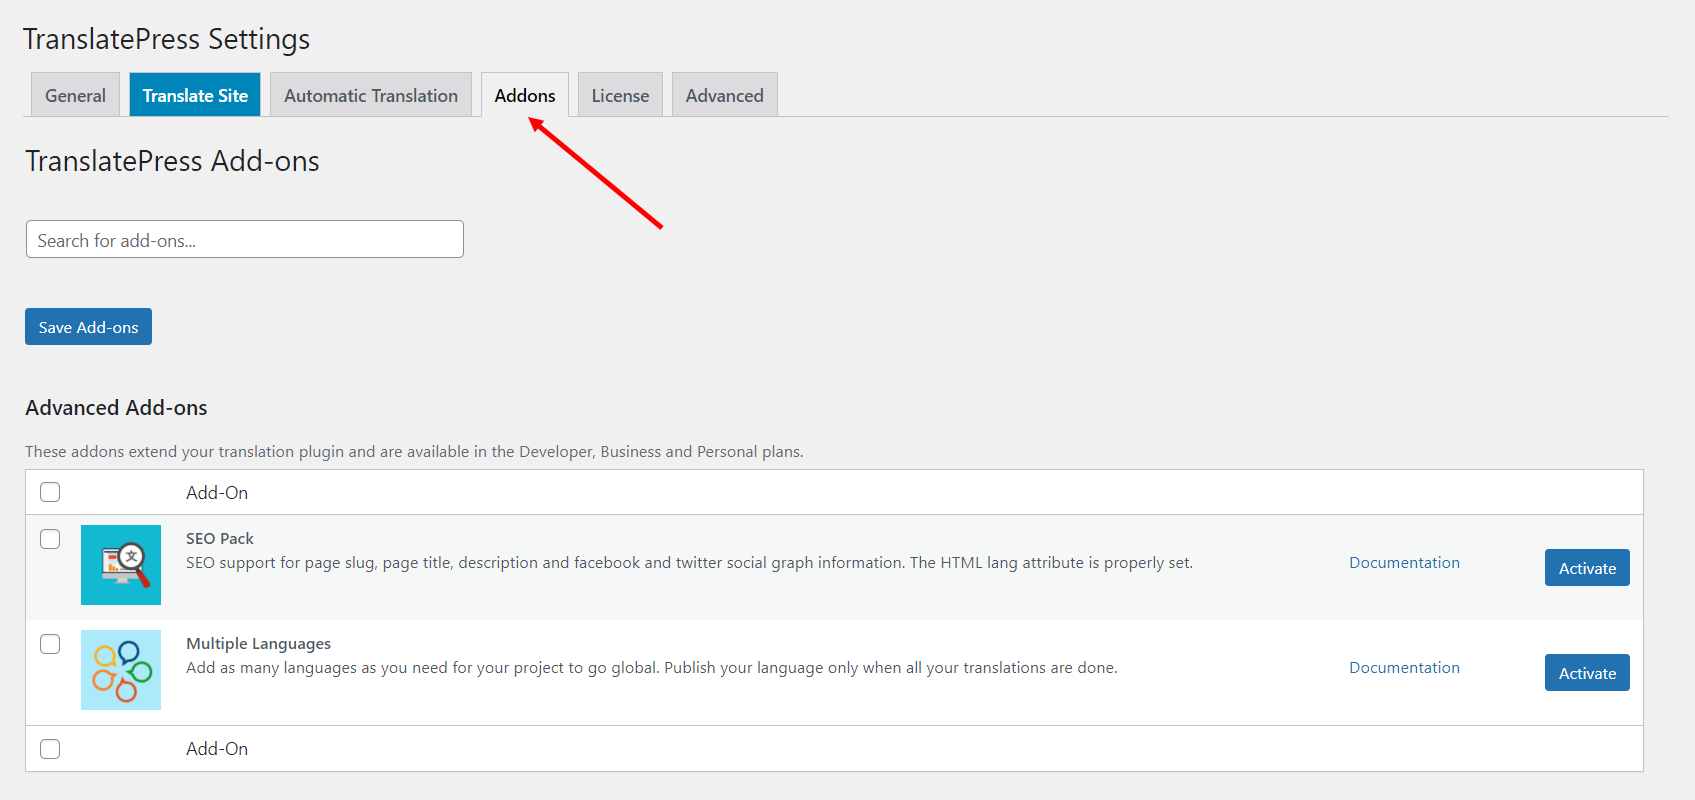 TranslatePress Settings Addons tab